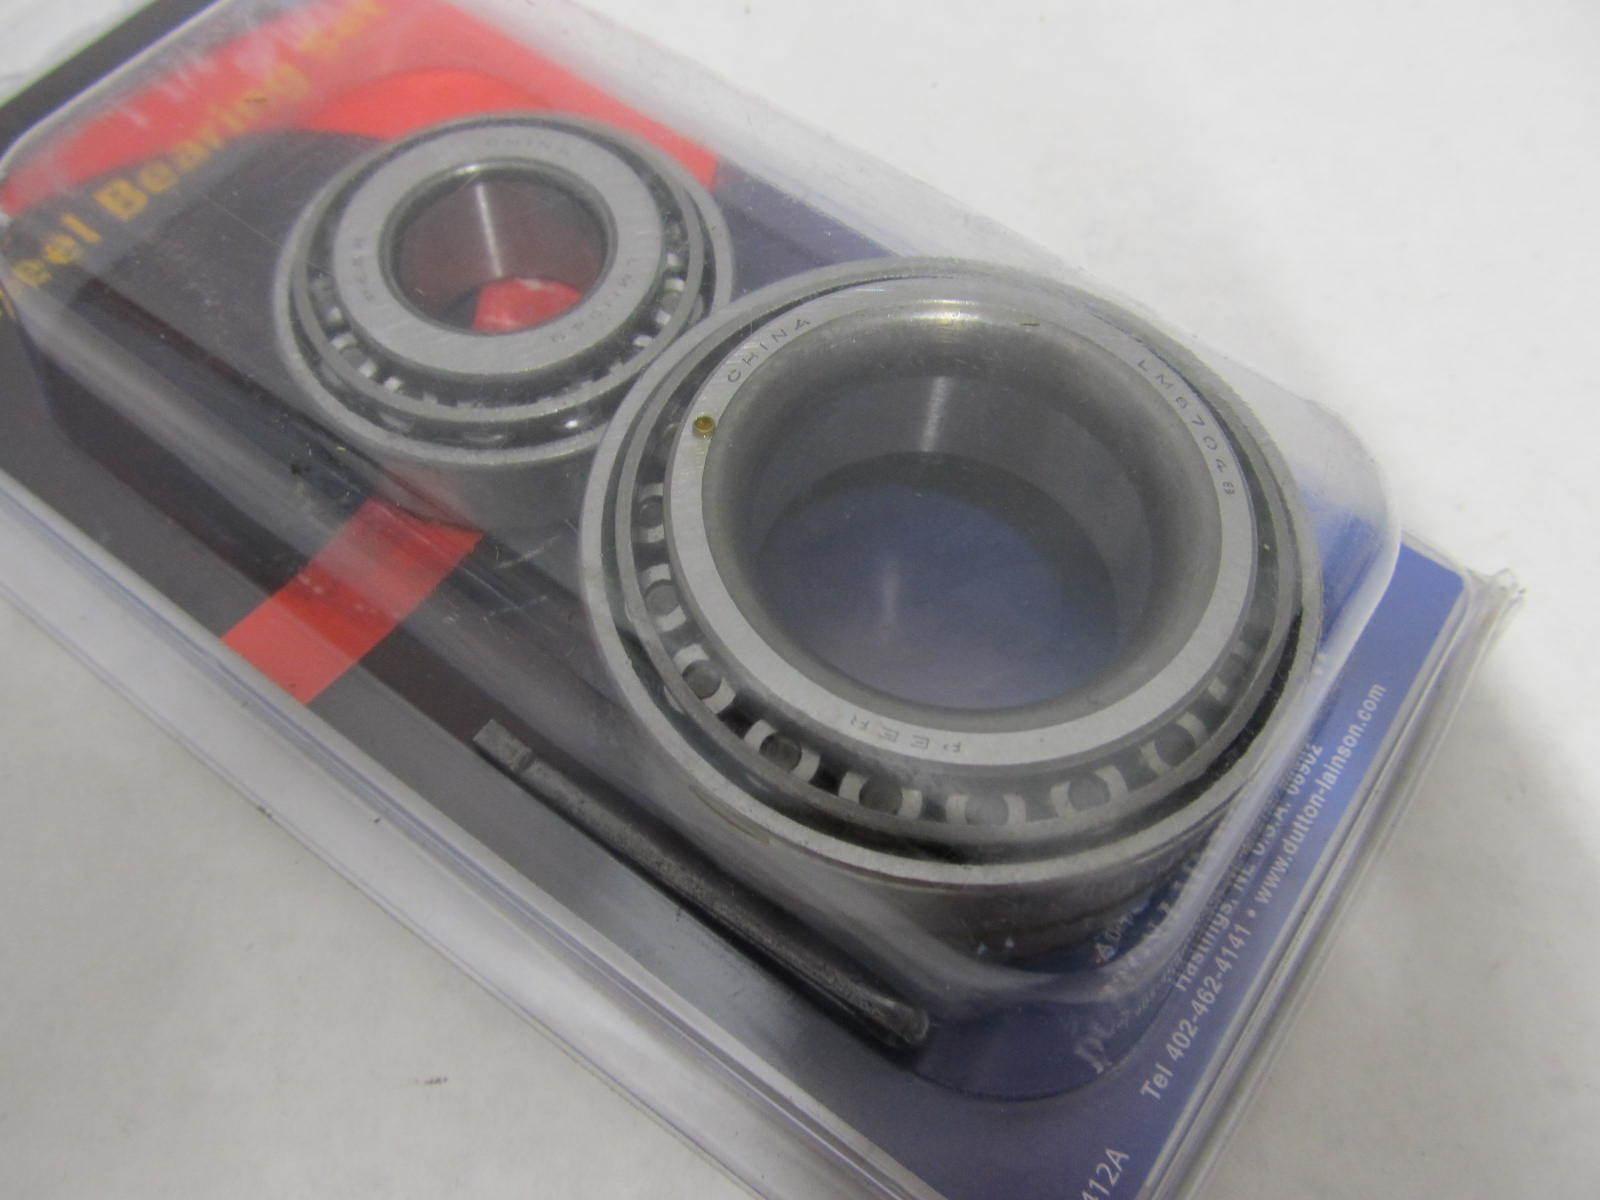 6506 Dutton Lainson Trailer Wheel Bearing Set 1 1 4 X 1 3